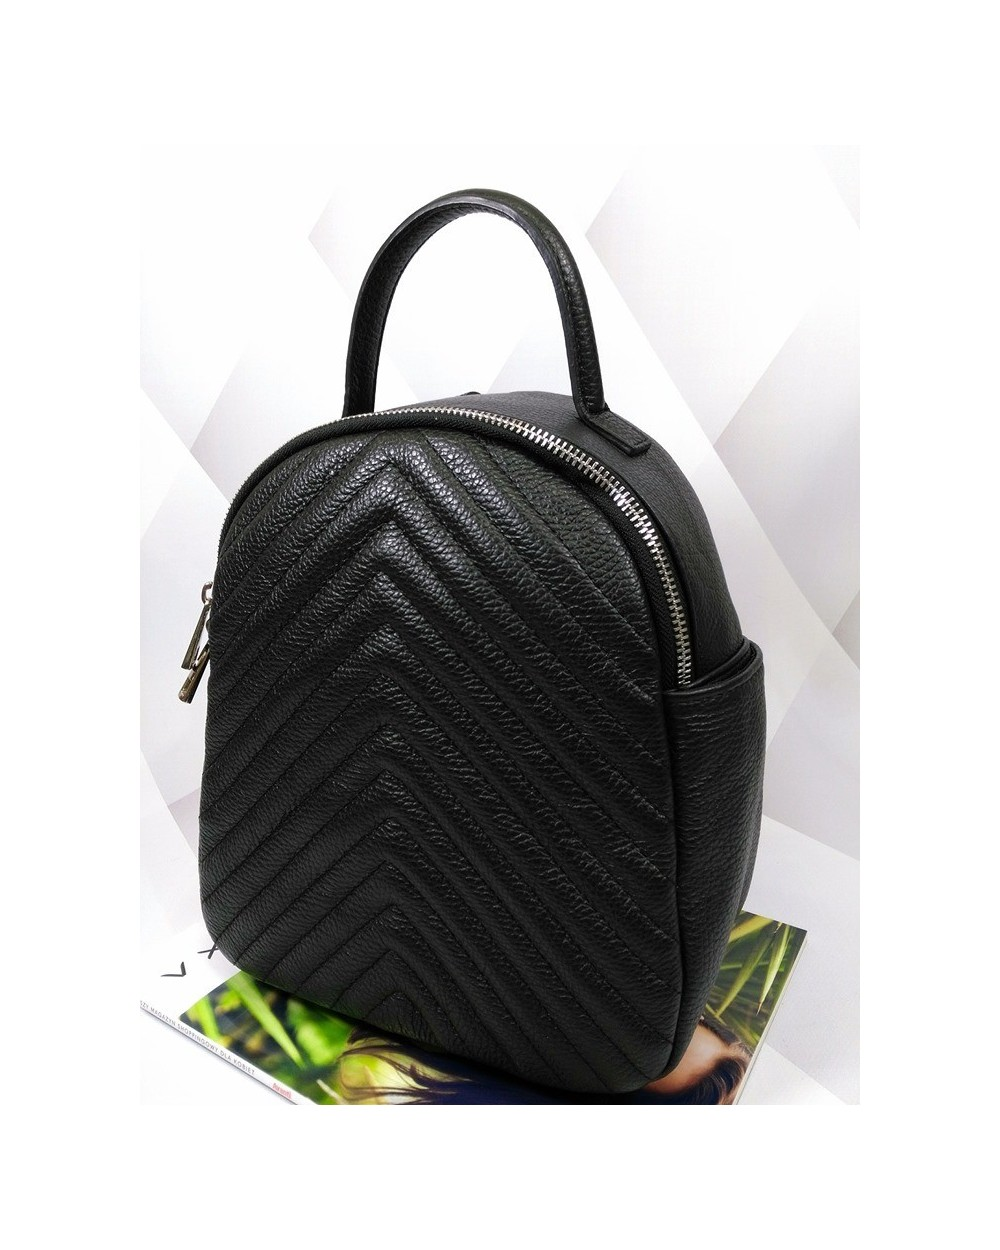 Plecak damski skórzany pikowany czarny